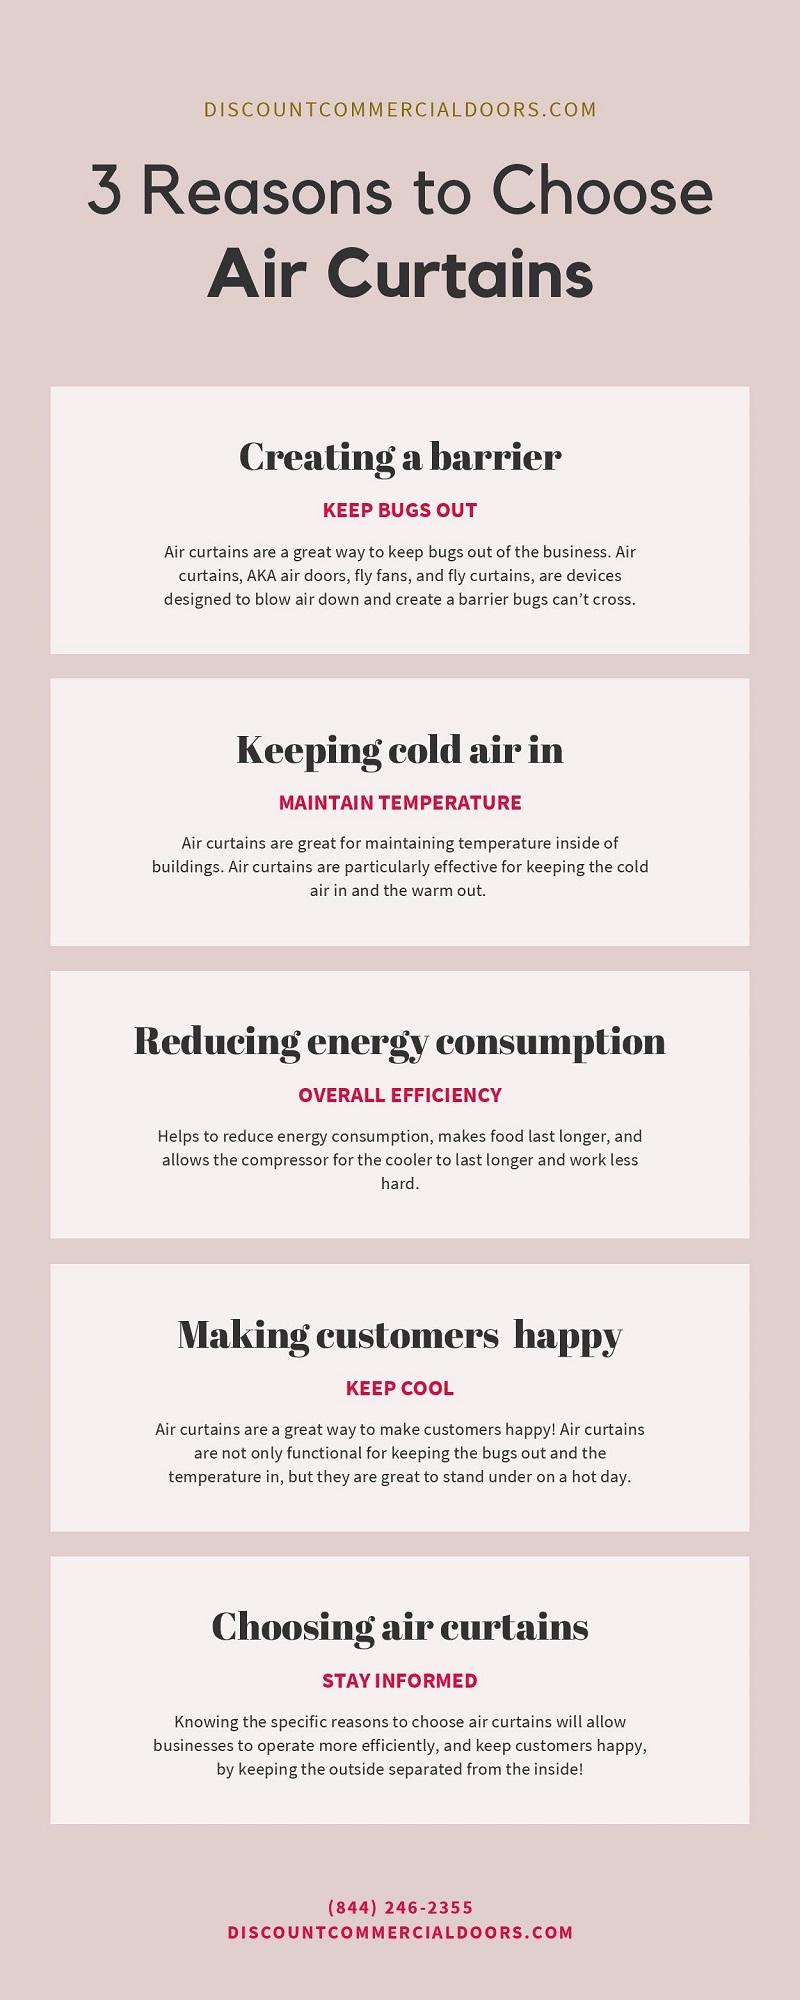 Reasons to Choose Air Curtains (3)